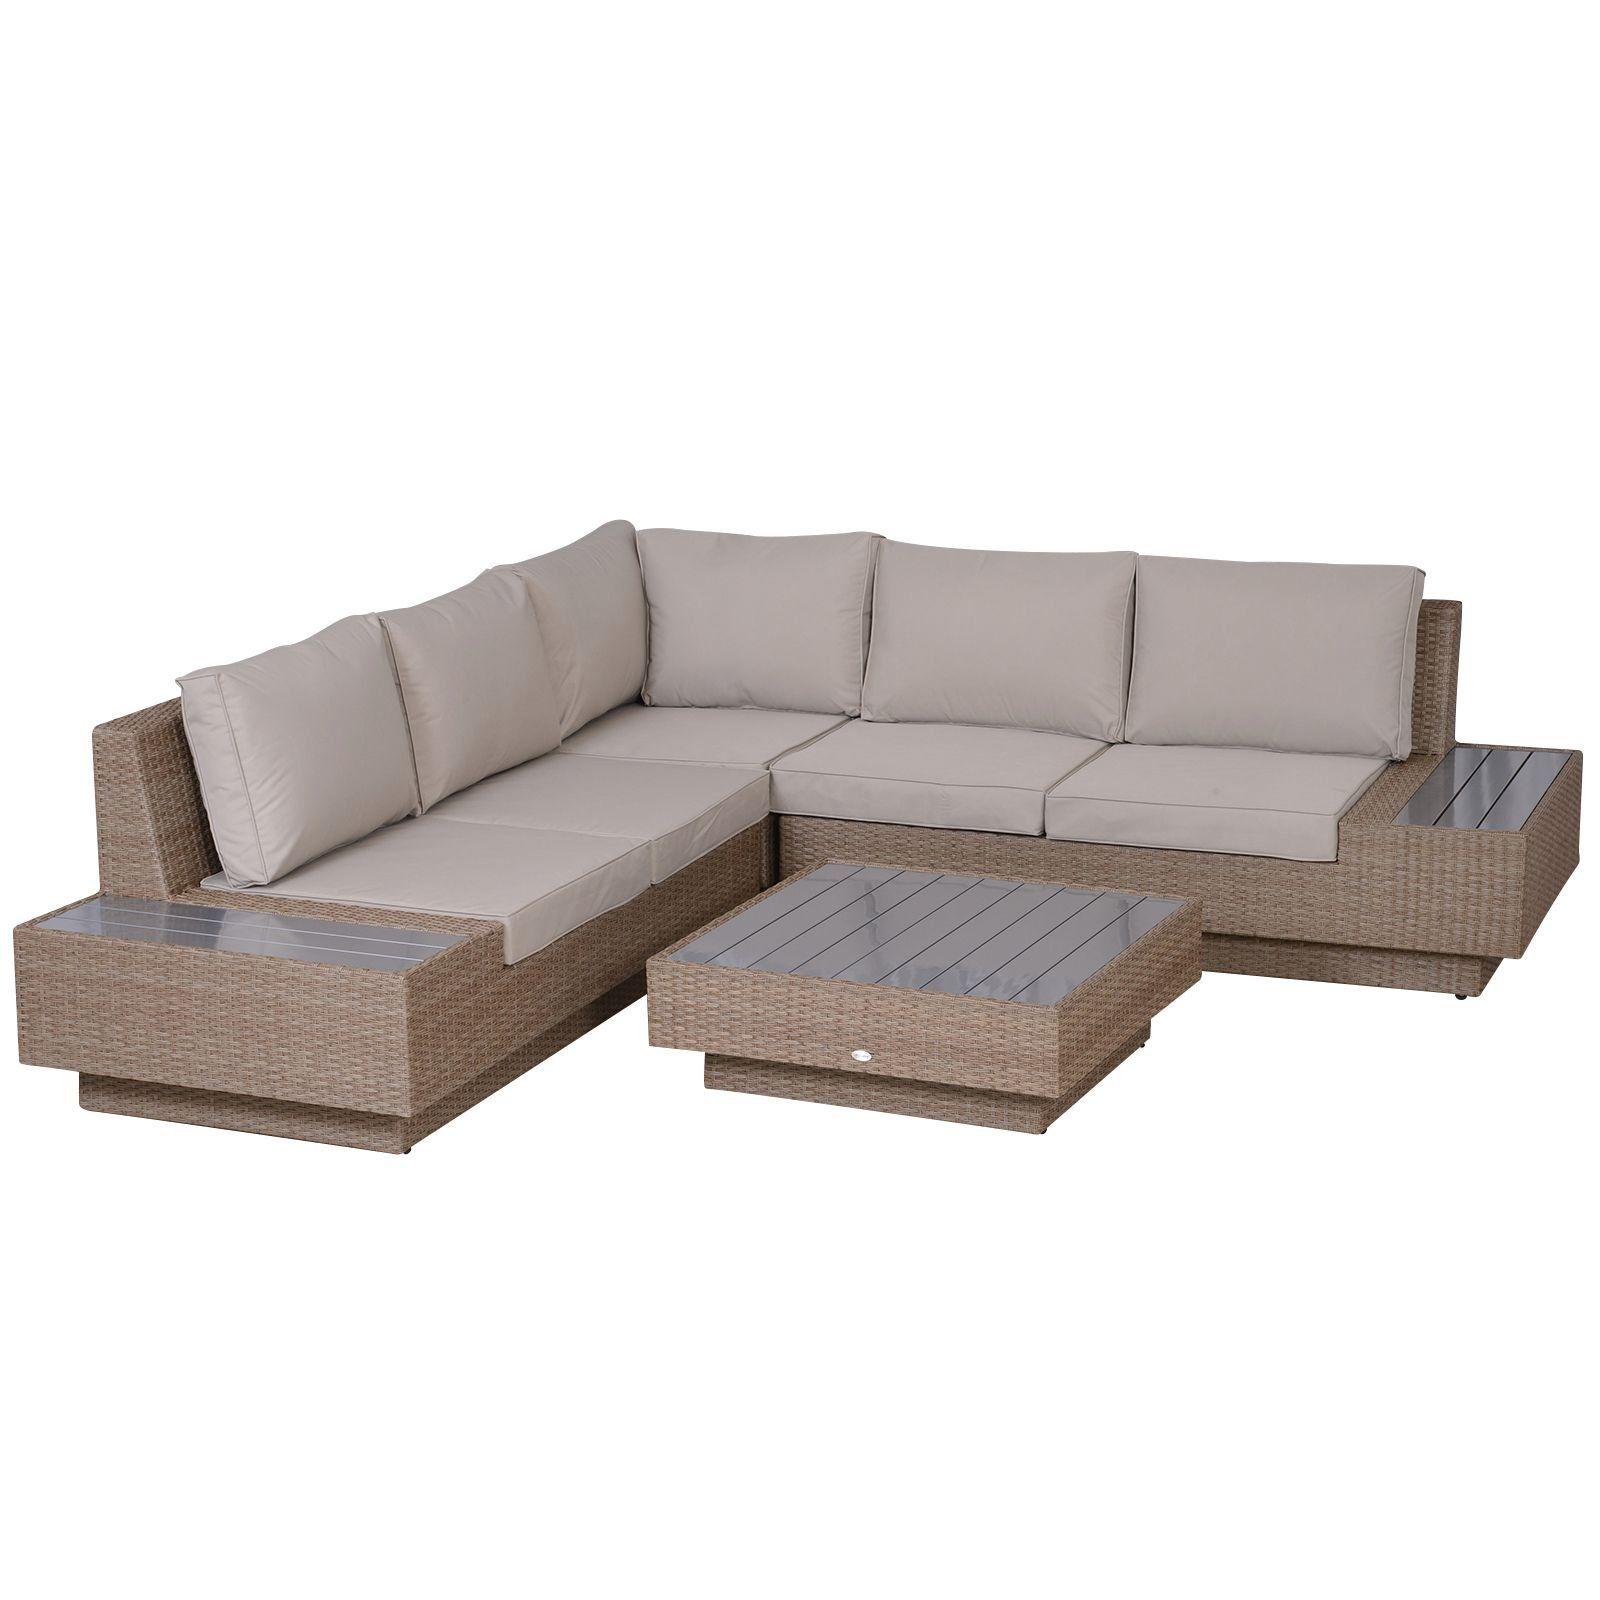 Outsunny 4 Pcs Rattan Sofa Furniture Set W Cushions Beige Aosom Uk 1000 In 2020 Corner Sofa Outdoor Sofa Furniture Rattan Garden Furniture Sets